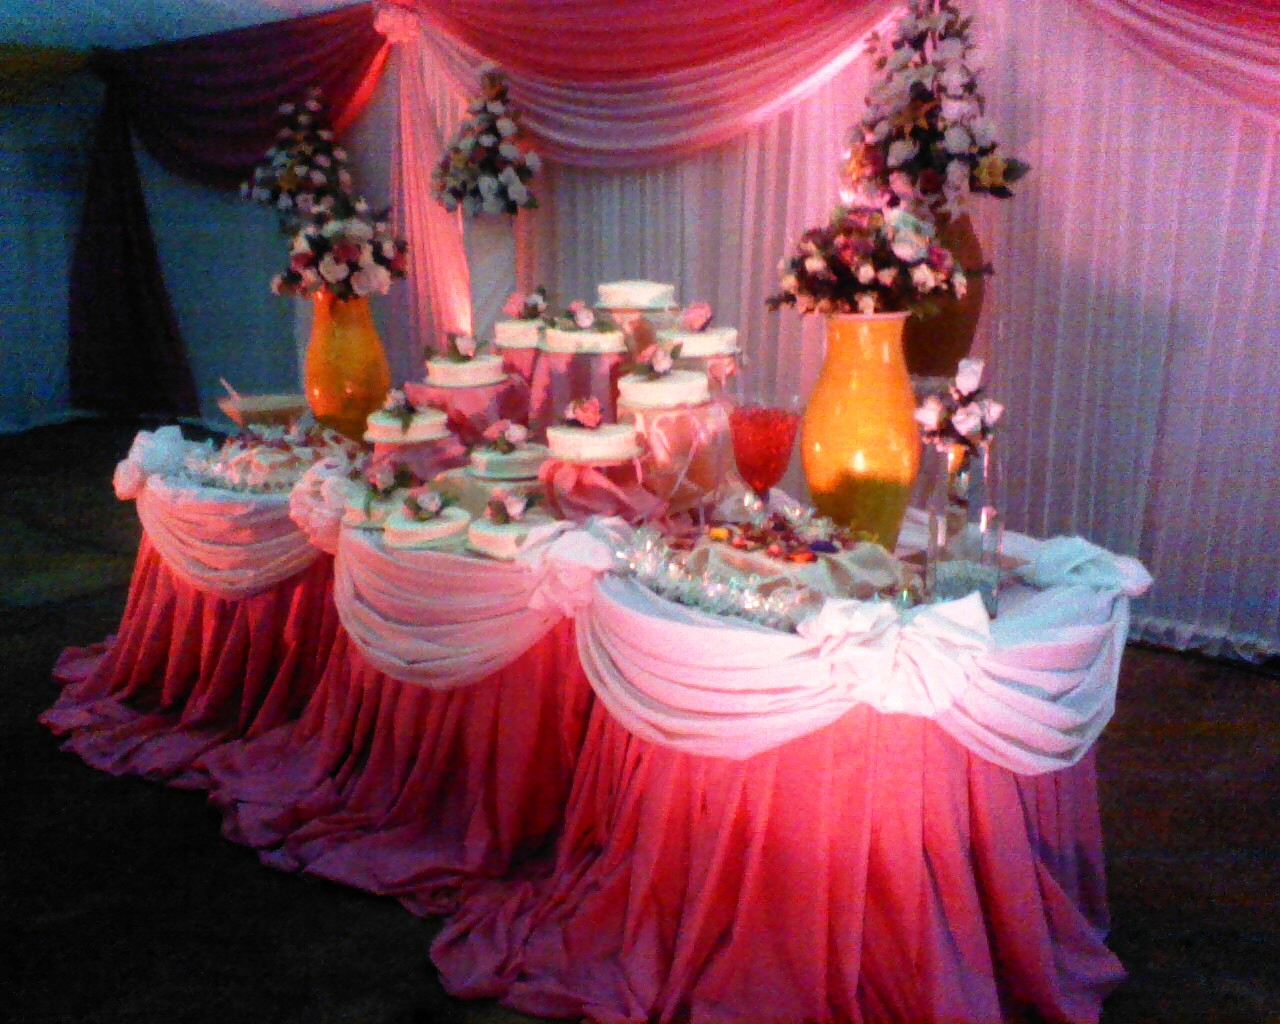 Decoracion de mesas para 15 anos for Mesas decoradas para 15 anos